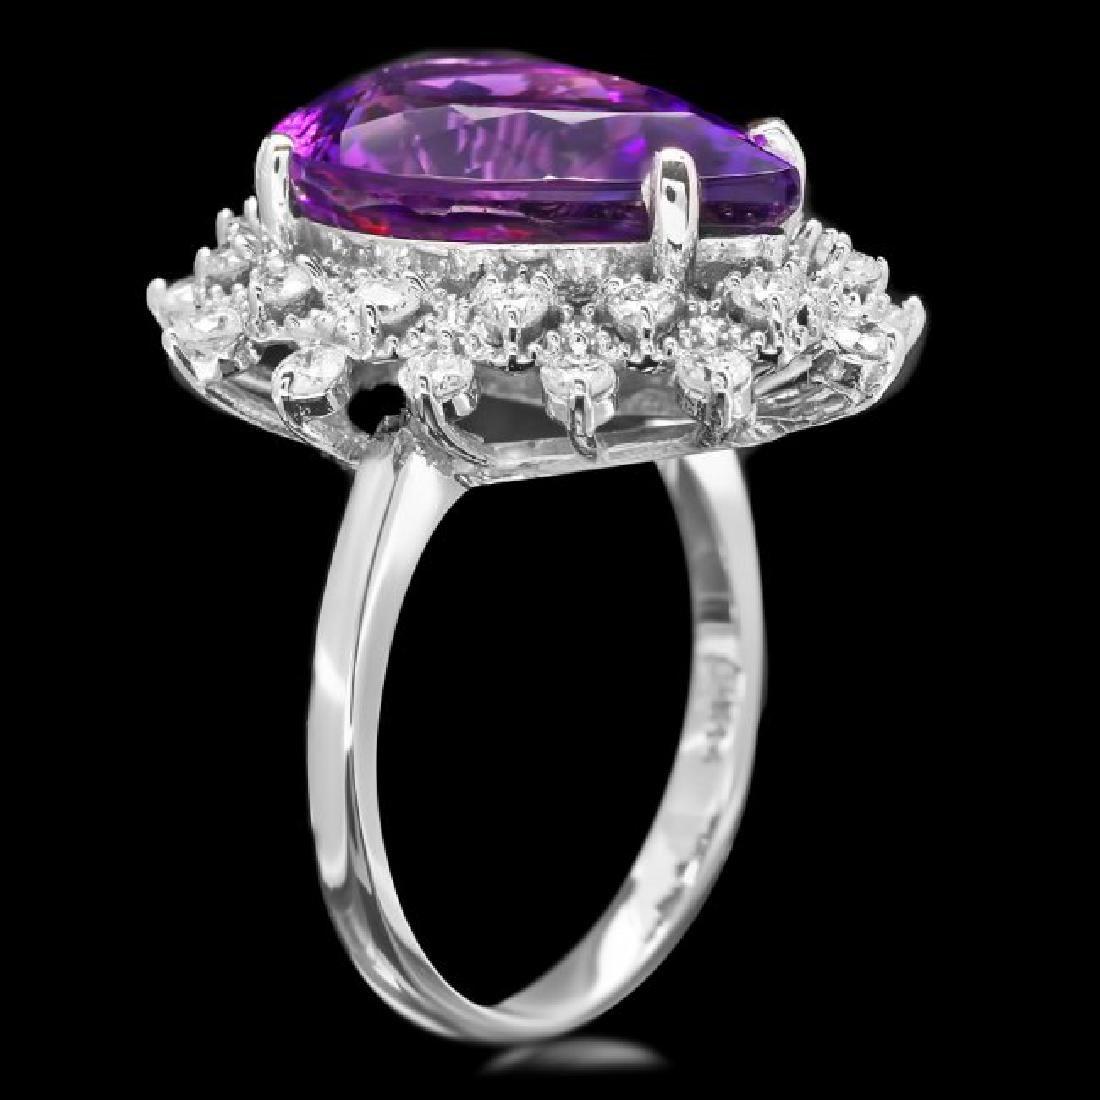 14k Gold 7.40ct Amethyst 0.95ct Diamond Ring - 3